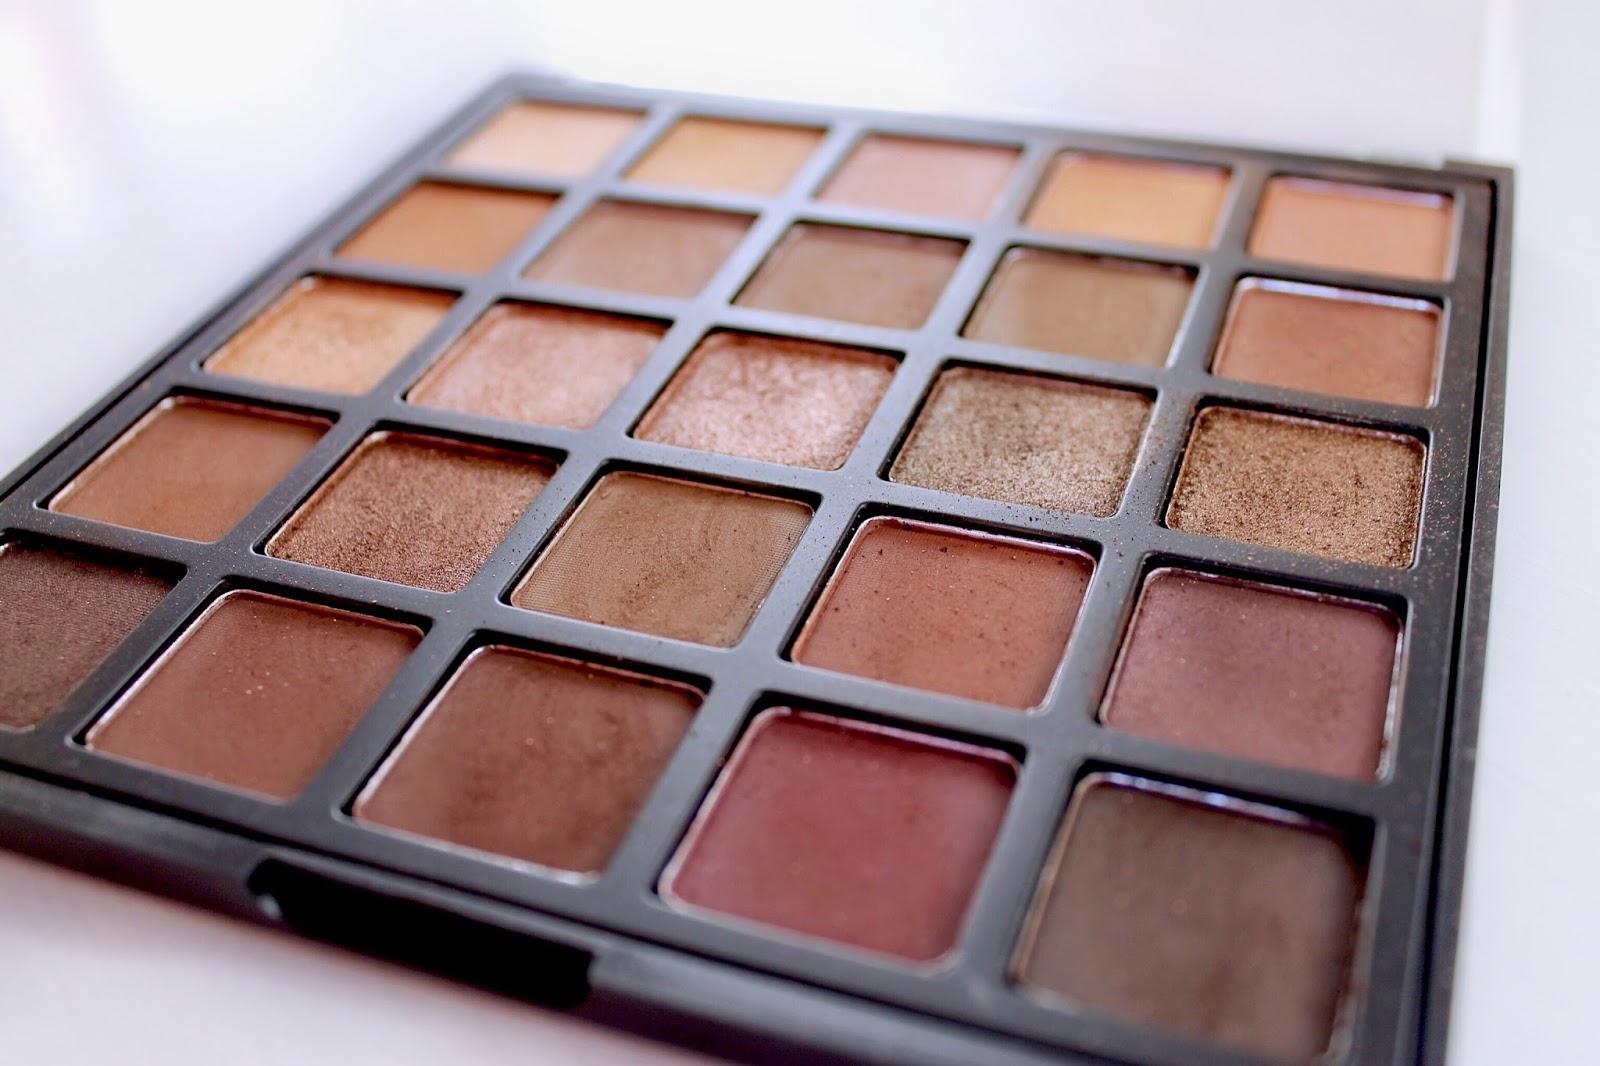 Morphe 25B Bronzed Mocha palette review